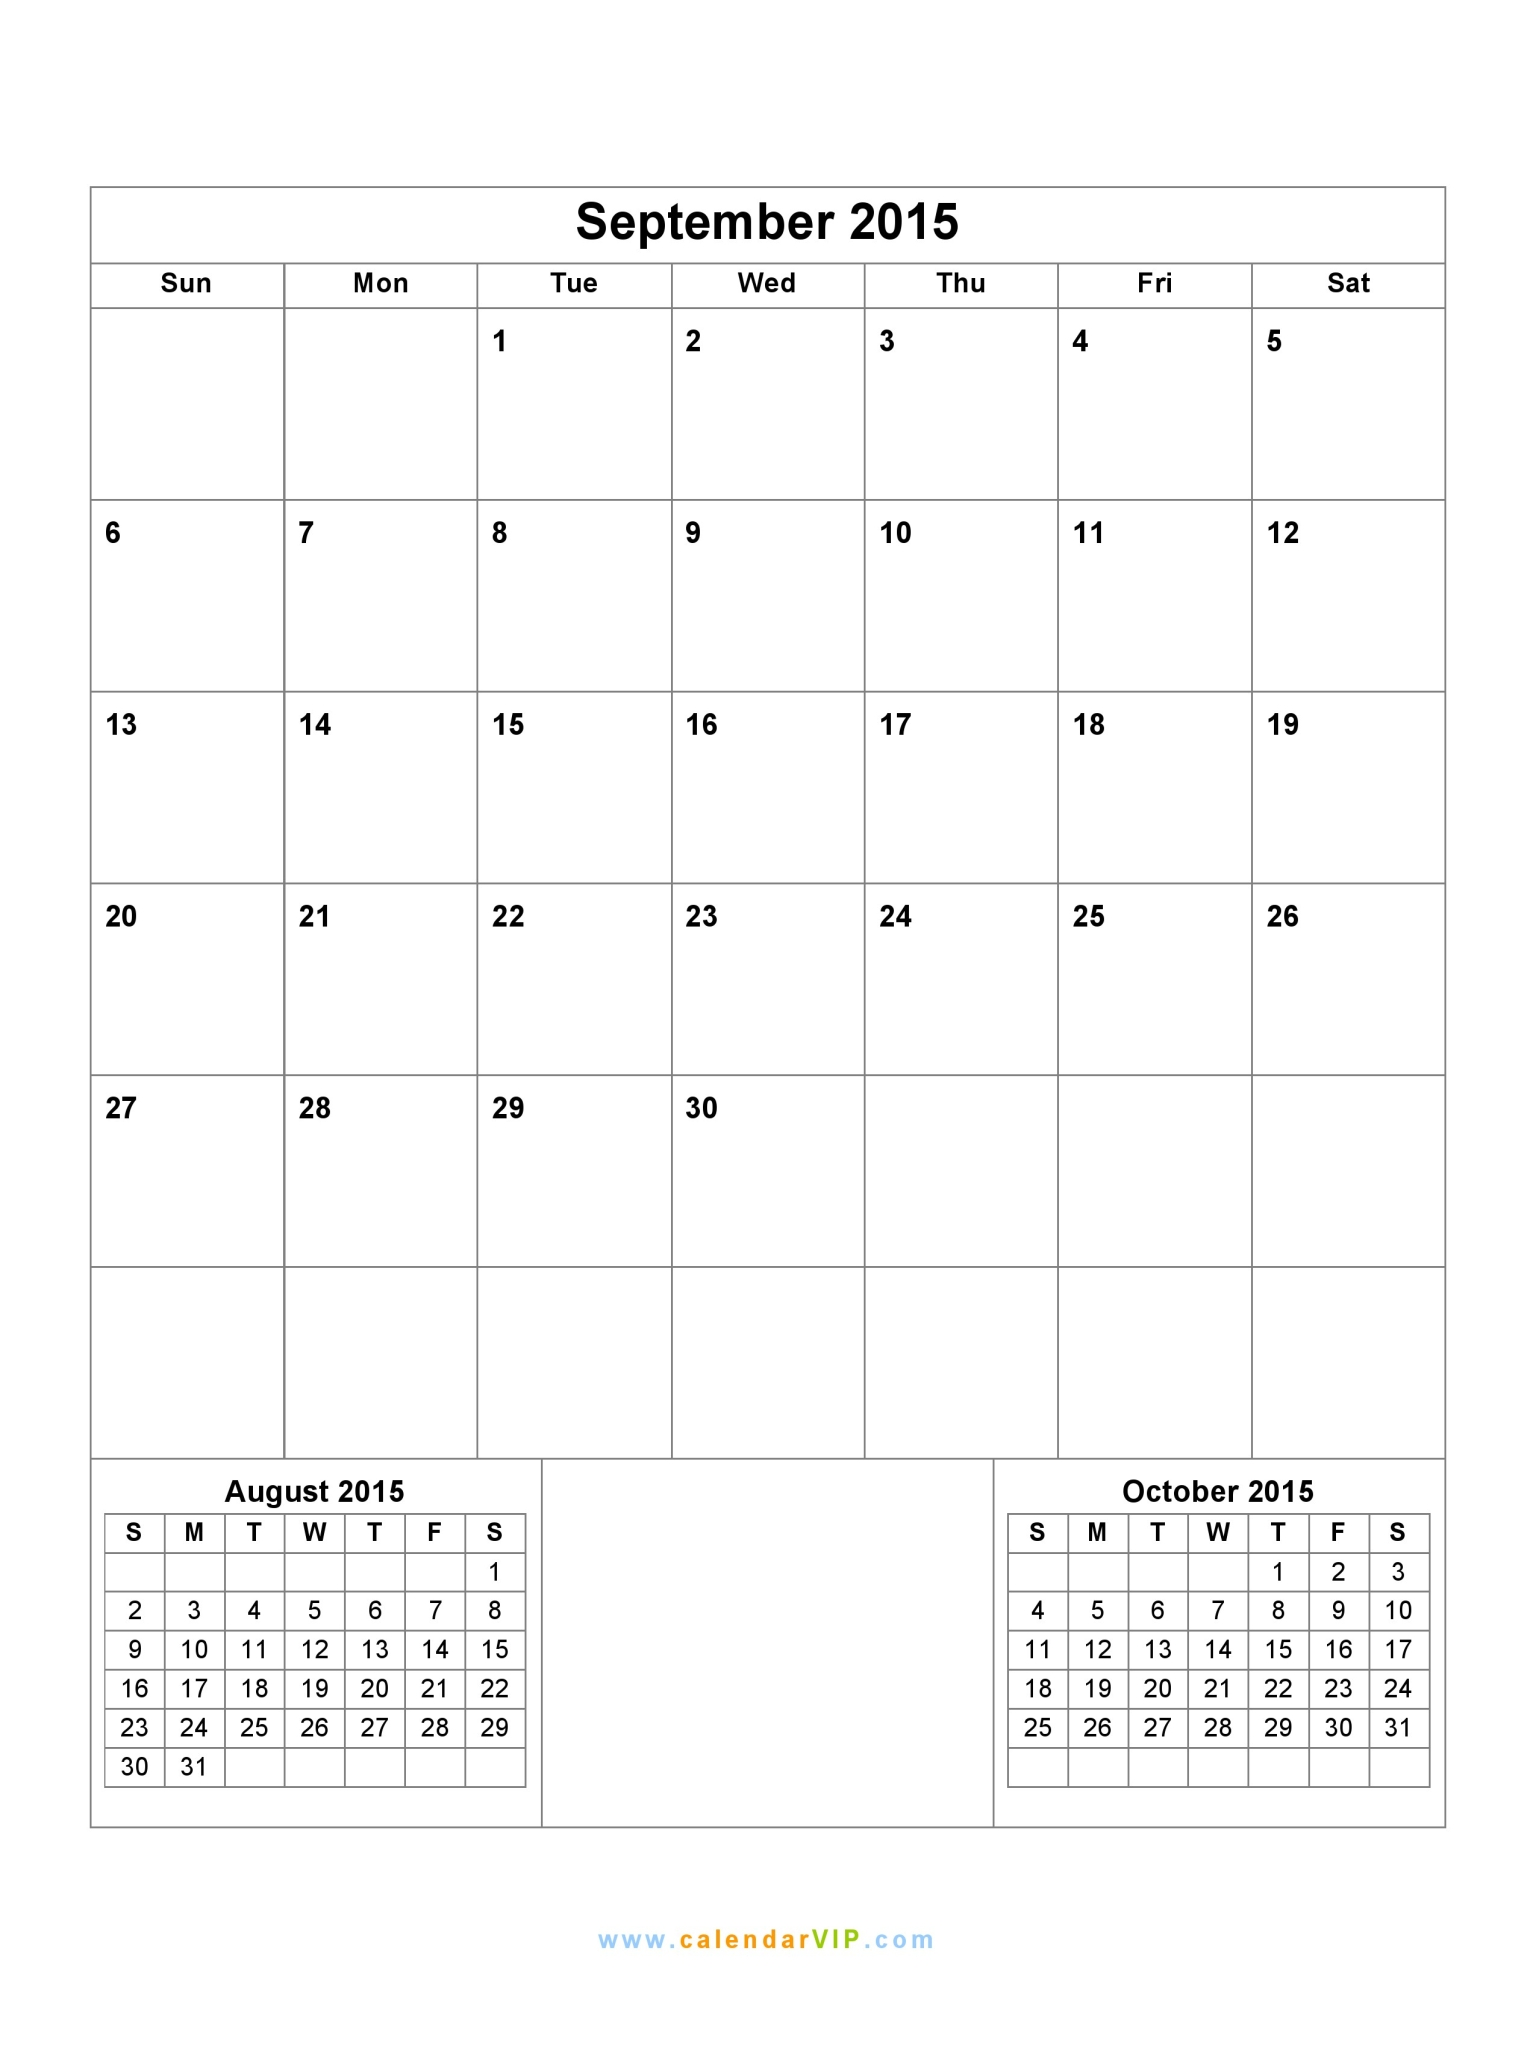 Wonderful 1 2 3 Nu Opgaver Kapitel Resume Tiny 1 Hexagon Template Regular 1 Year Experienced Software Developer Resume Sample 100 Resume Words Young 1920s Newspaper Template Brown1st Place Certificate Templates September 2015 Calendar   Blank Printable Calendar Template In PDF ..